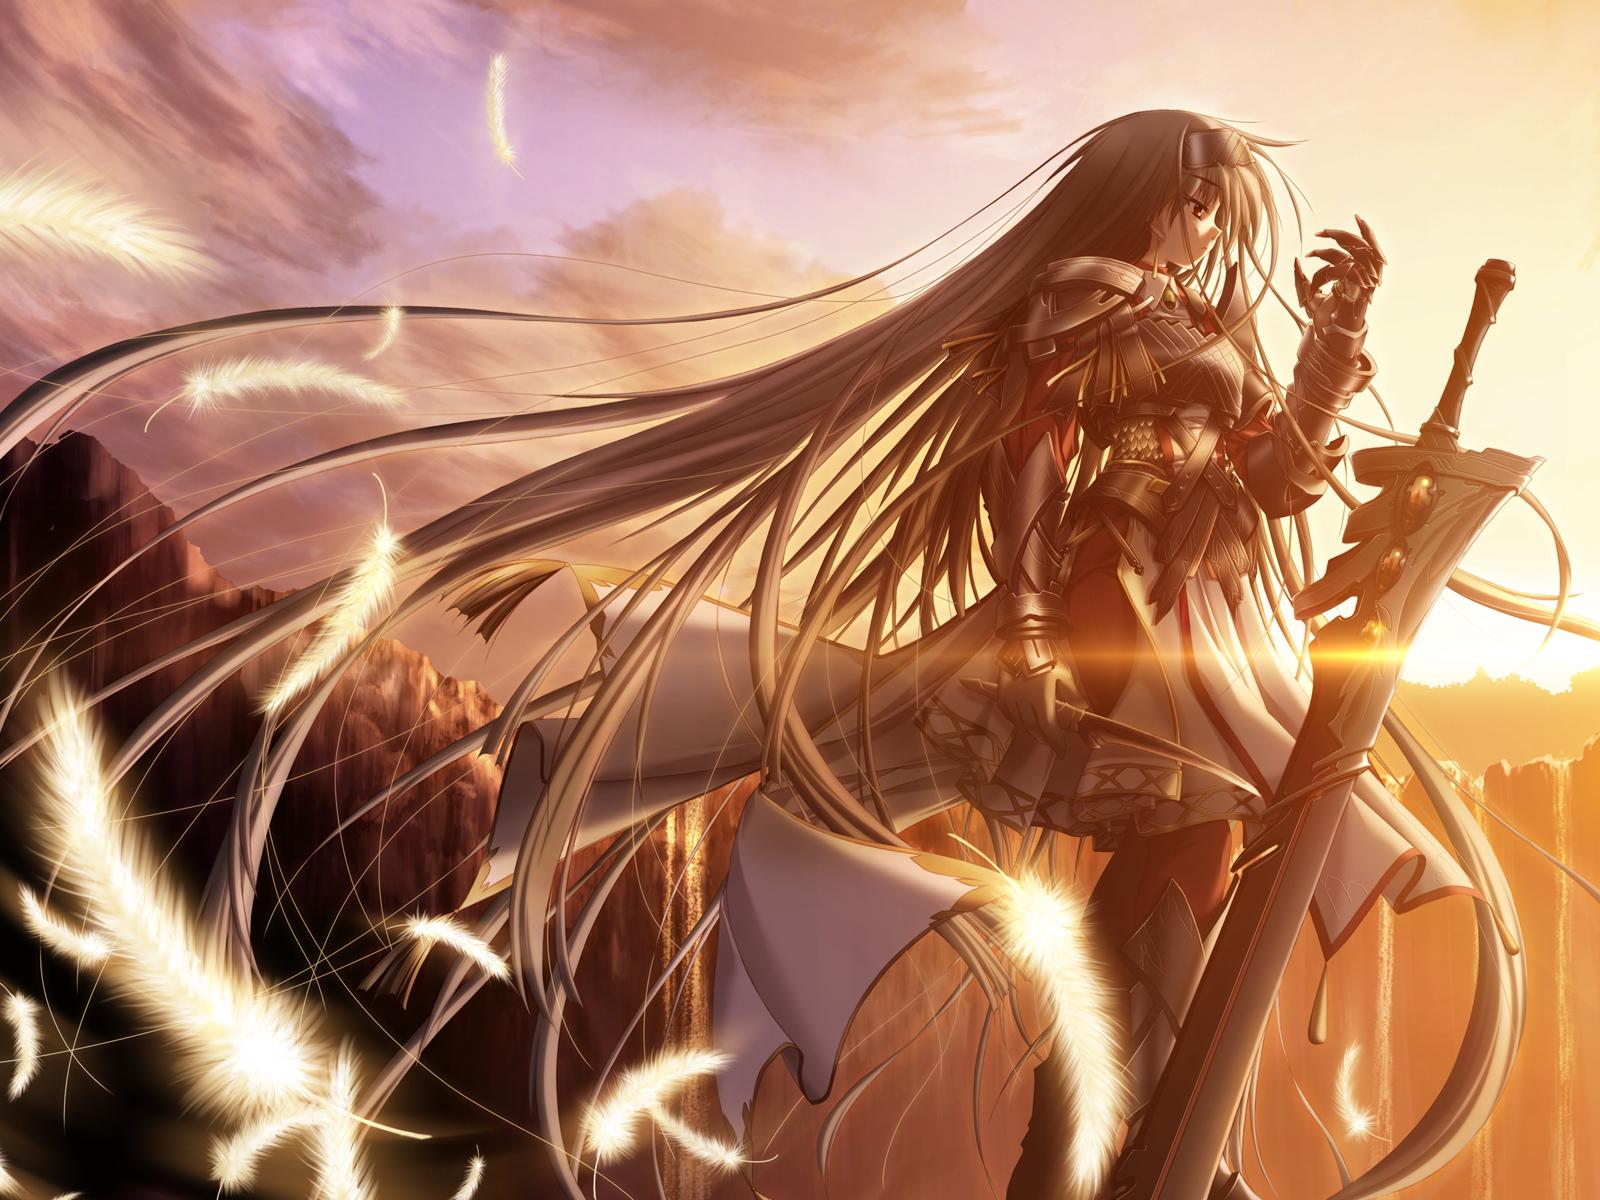 Anime 1600x1200 anime anime girls sword Gamer tech long hair hair   standing feathers fantasy art fantasy girl original characters sunlight armor